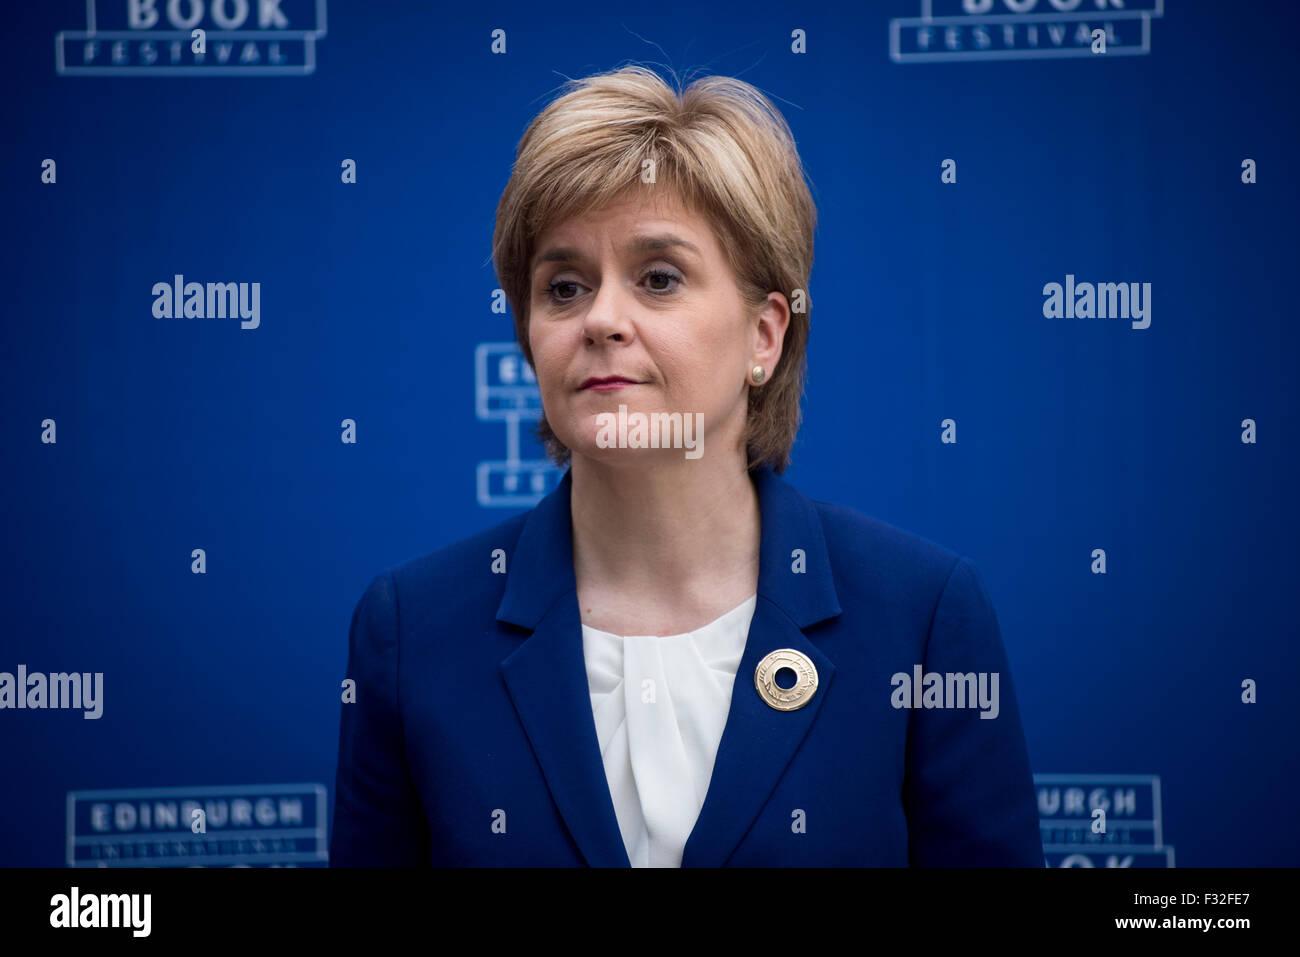 Premier ministre écossais Nicola Sturgeon. Photo Stock